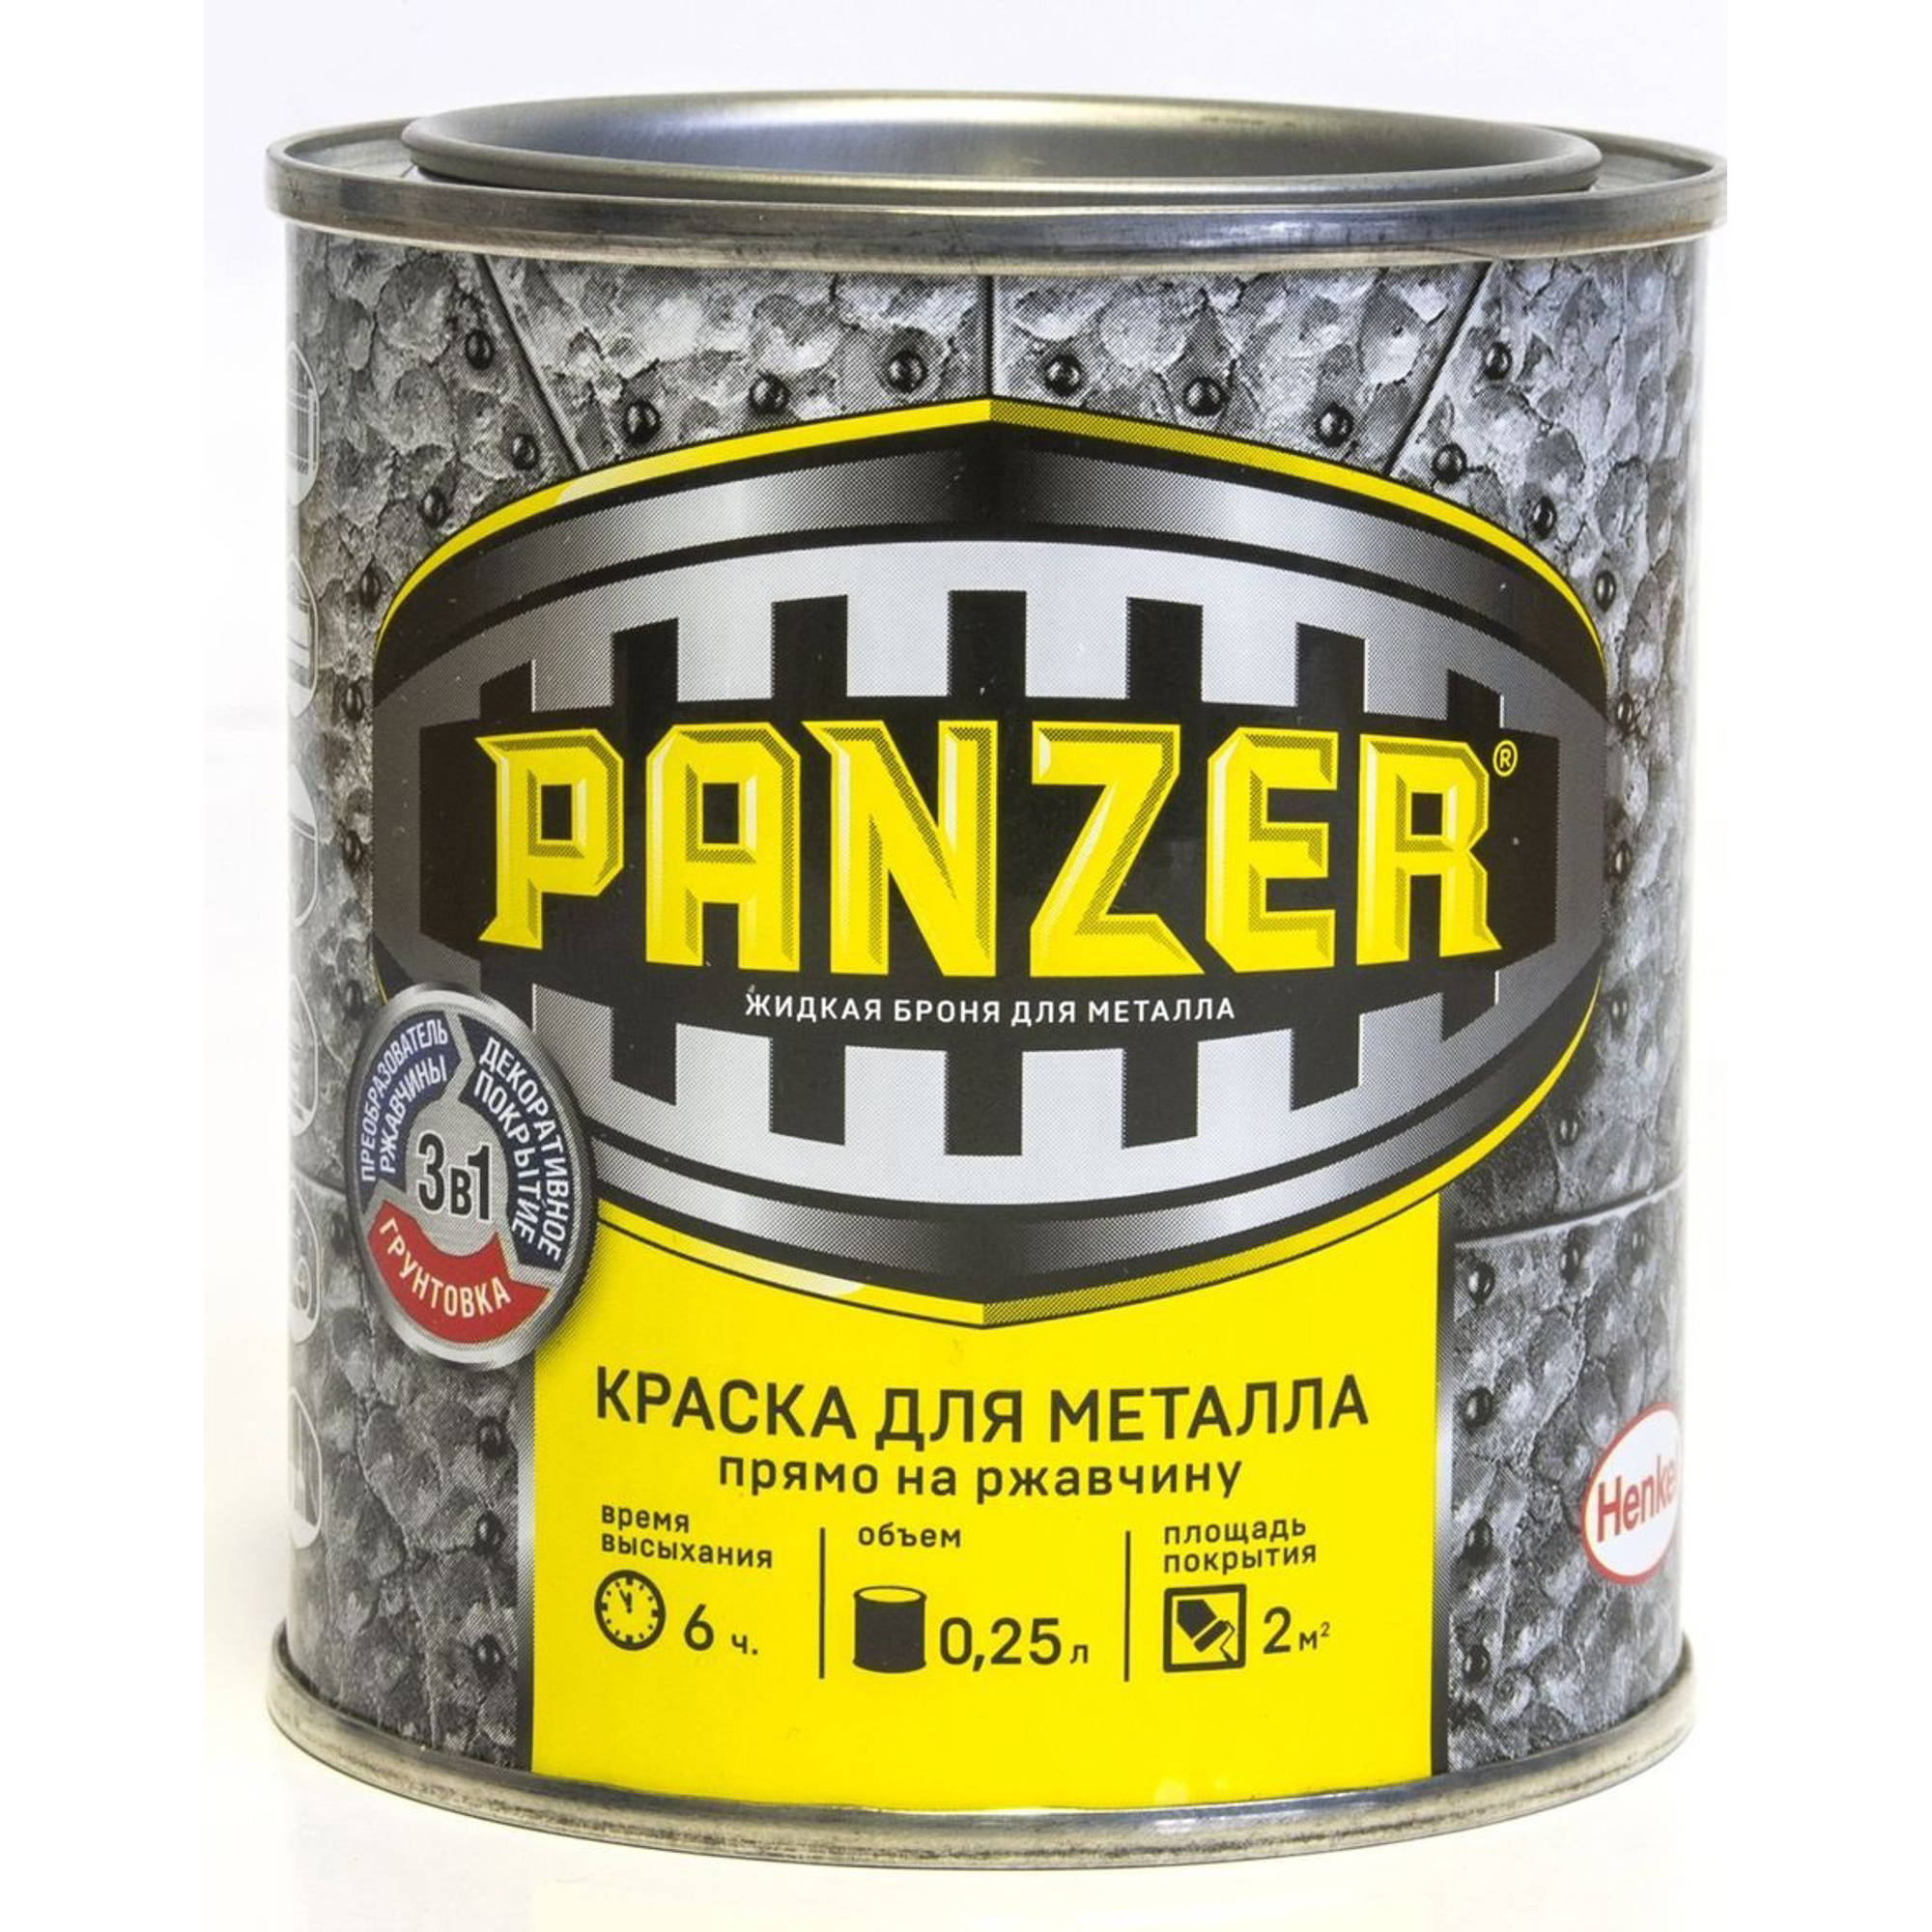 Краска для металла Panzer гладкая желтая 0.25 л недорого